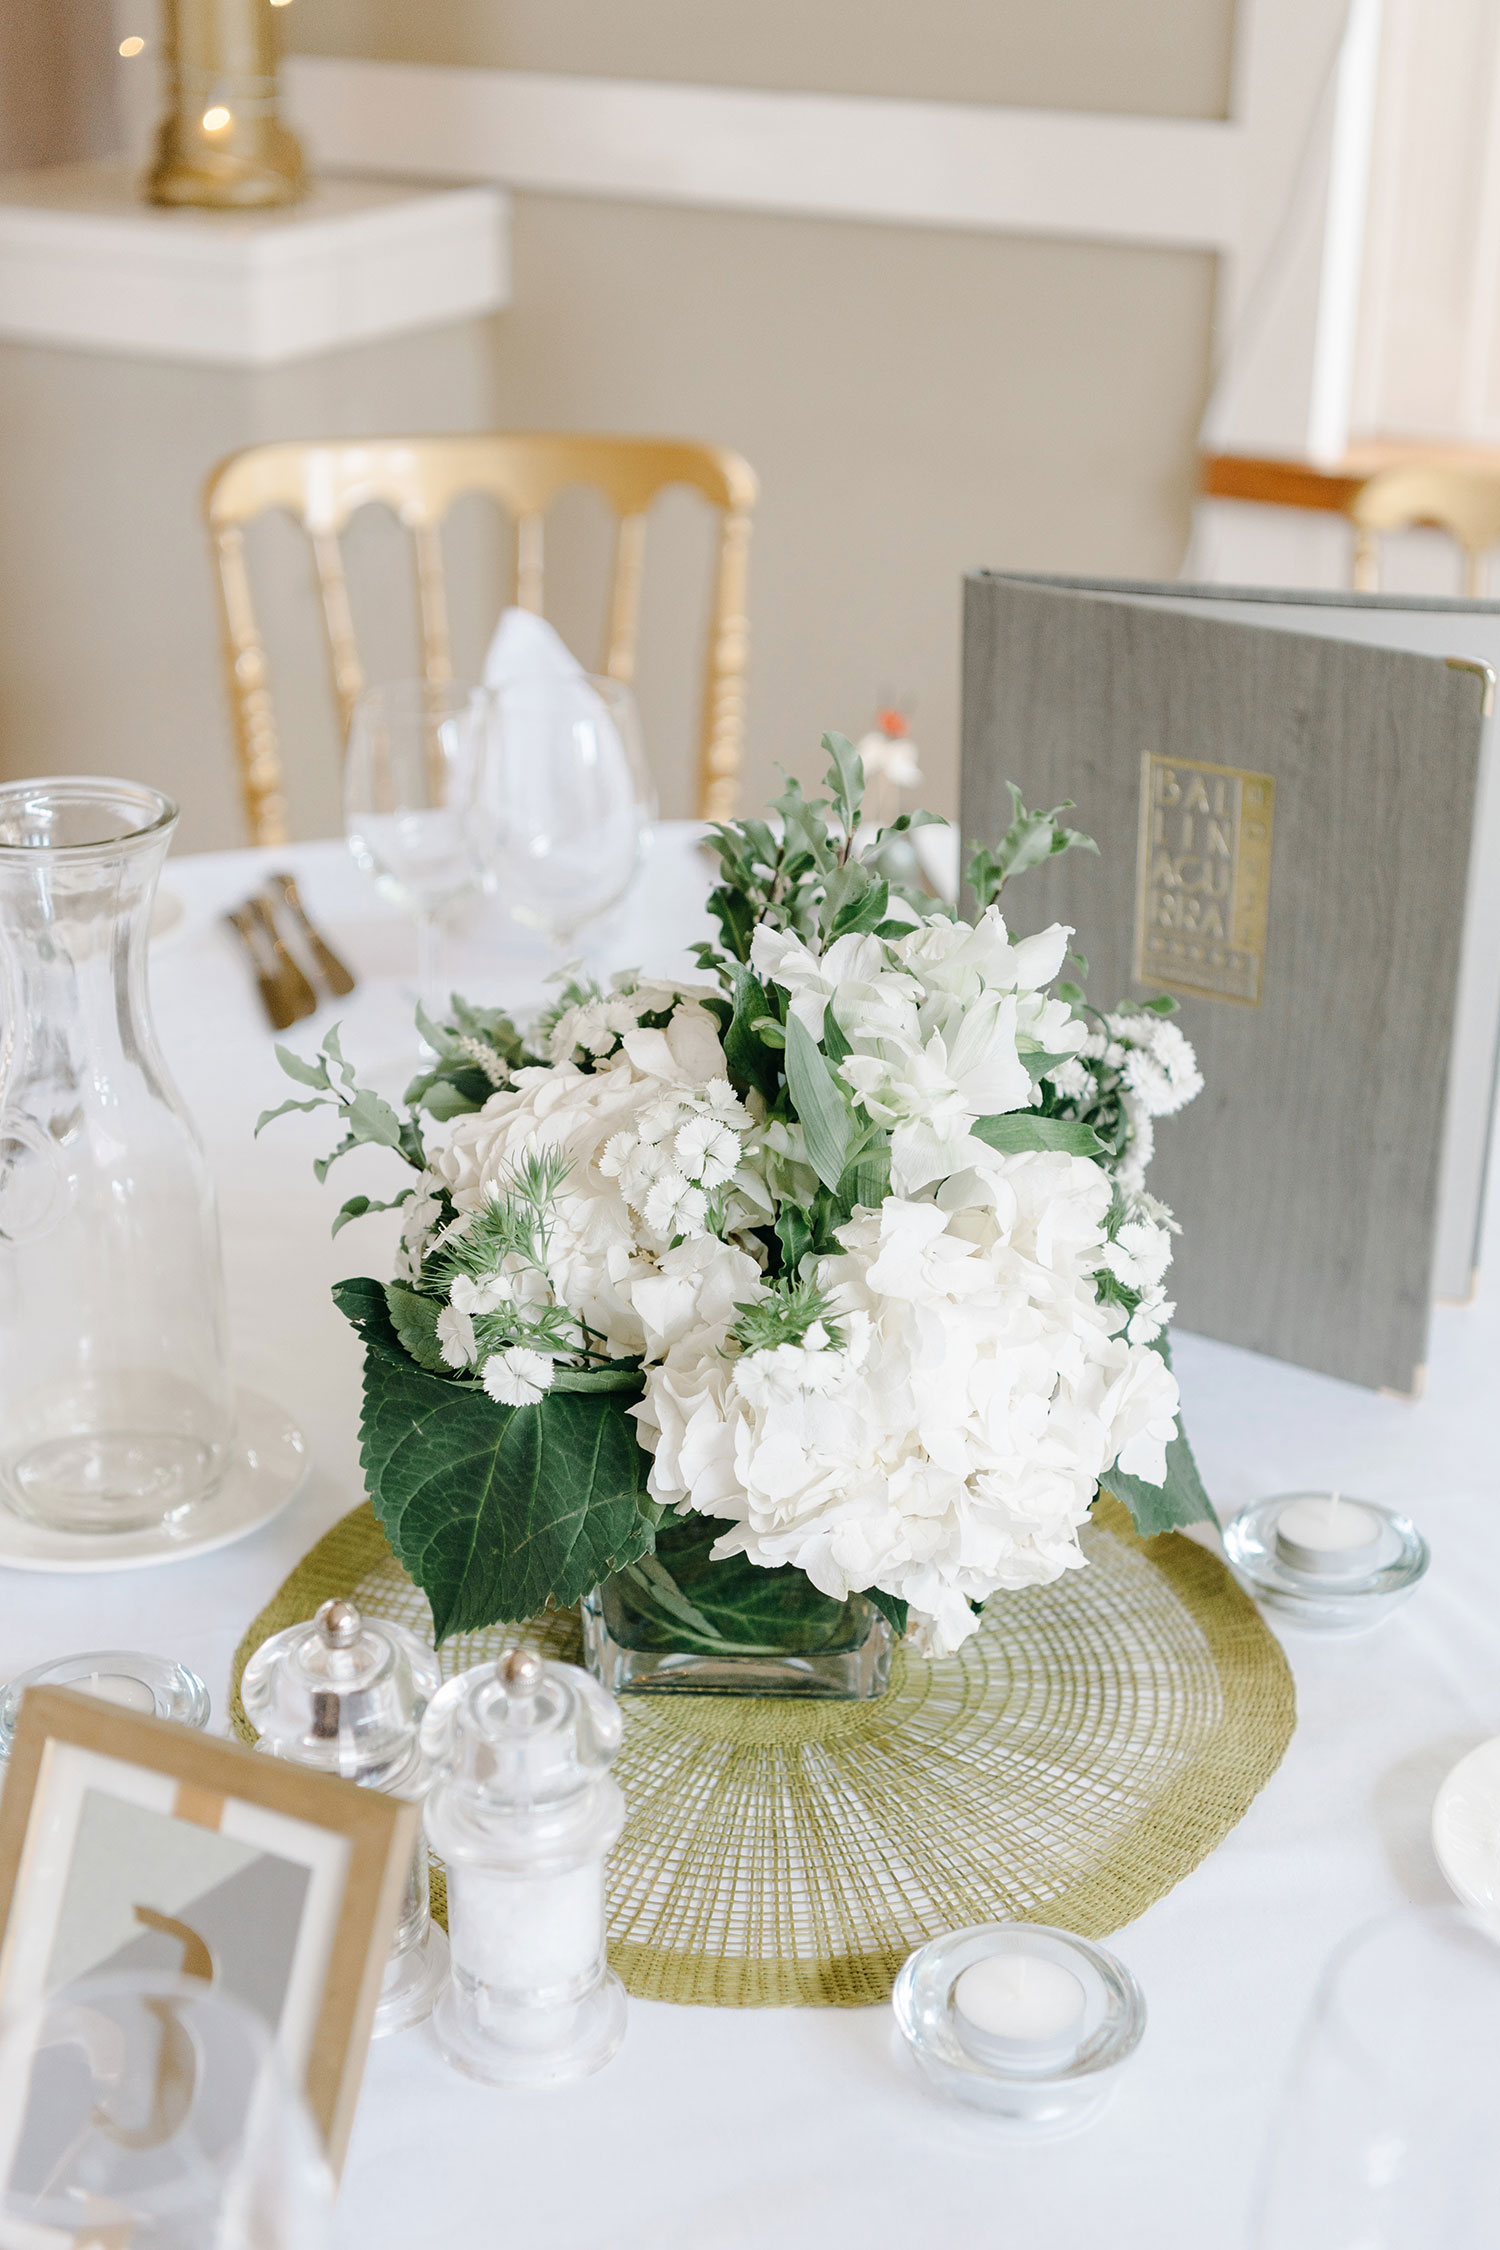 destination-wedding-photographer-ballinacurra-house-wedding-20180711_0070.jpg